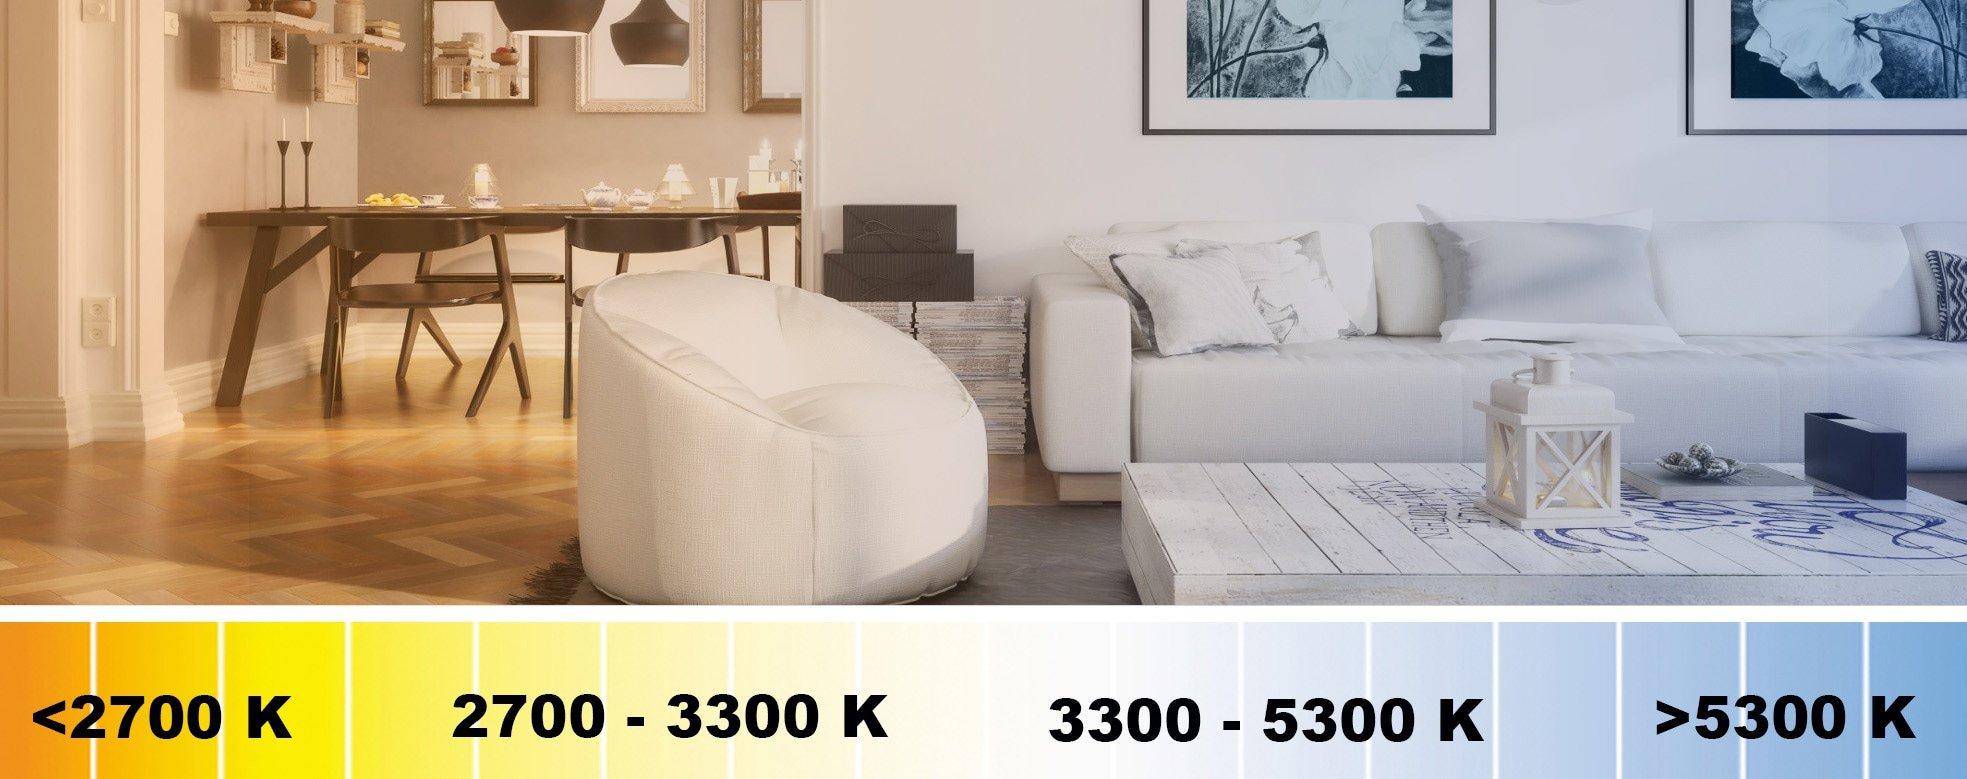 living room color temperature